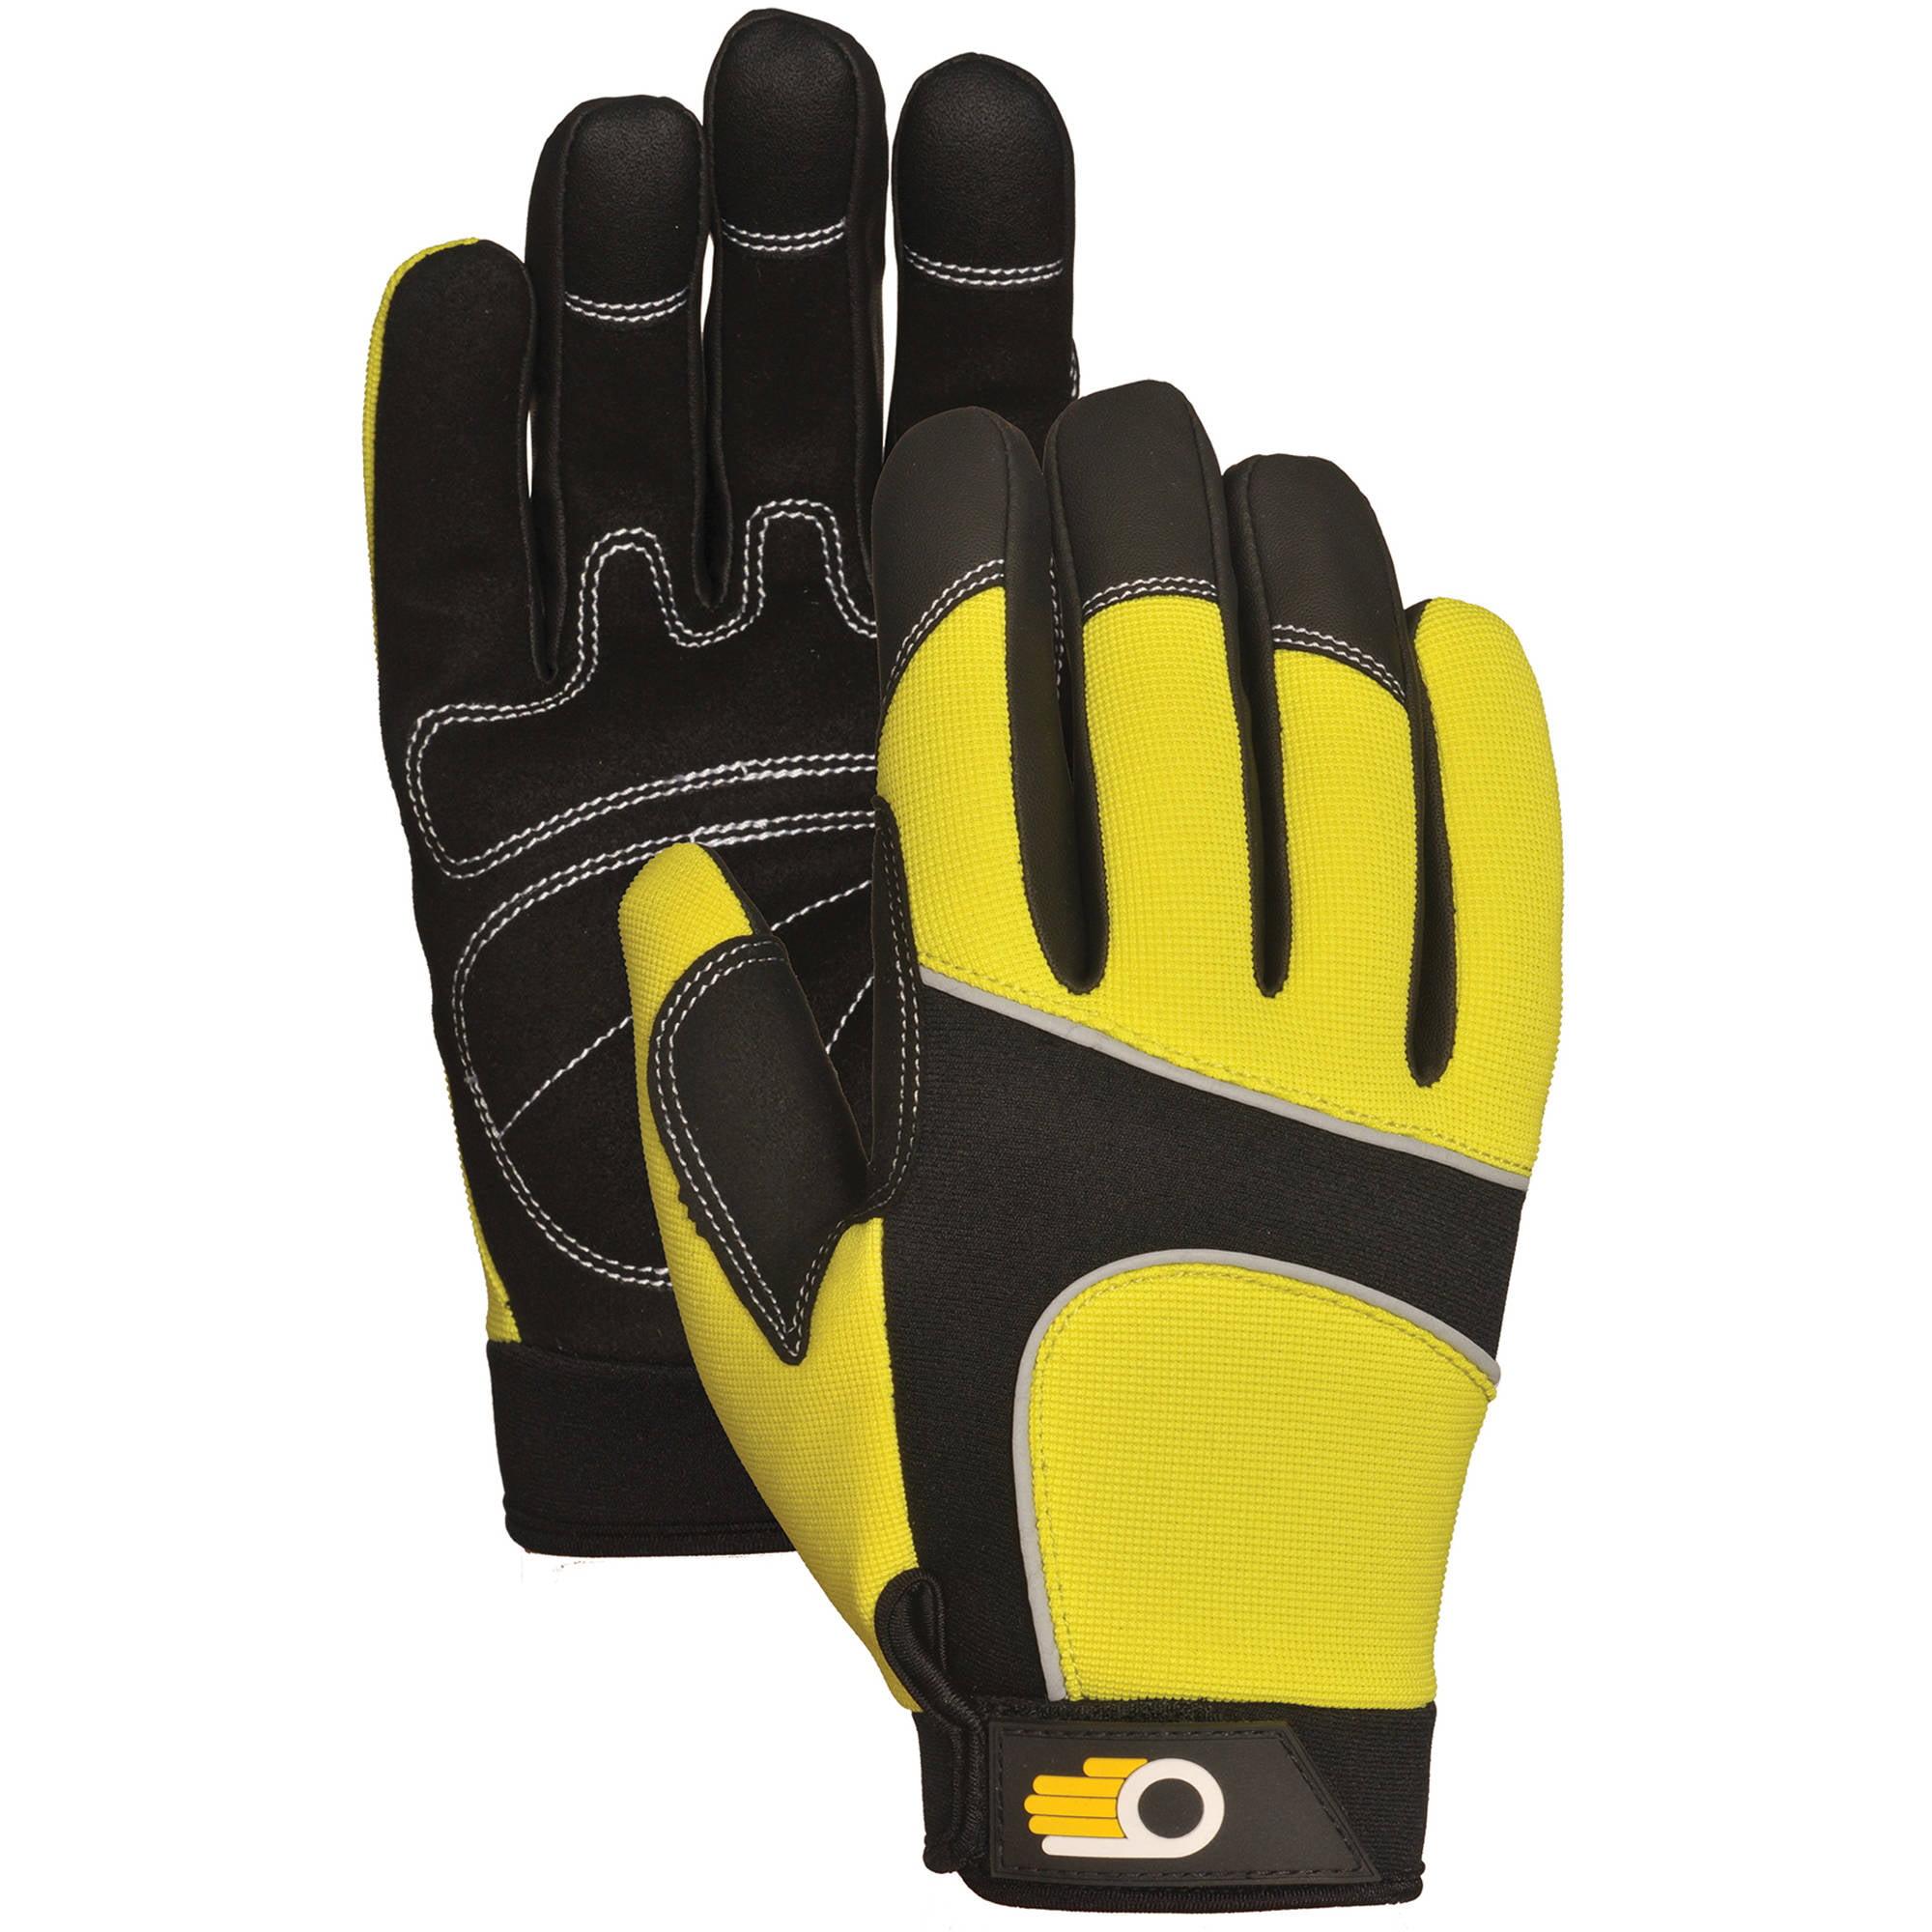 Bellingham Glove C7782HVXL XL Men's Performance Hi Viz Synthetic Palm Gloves